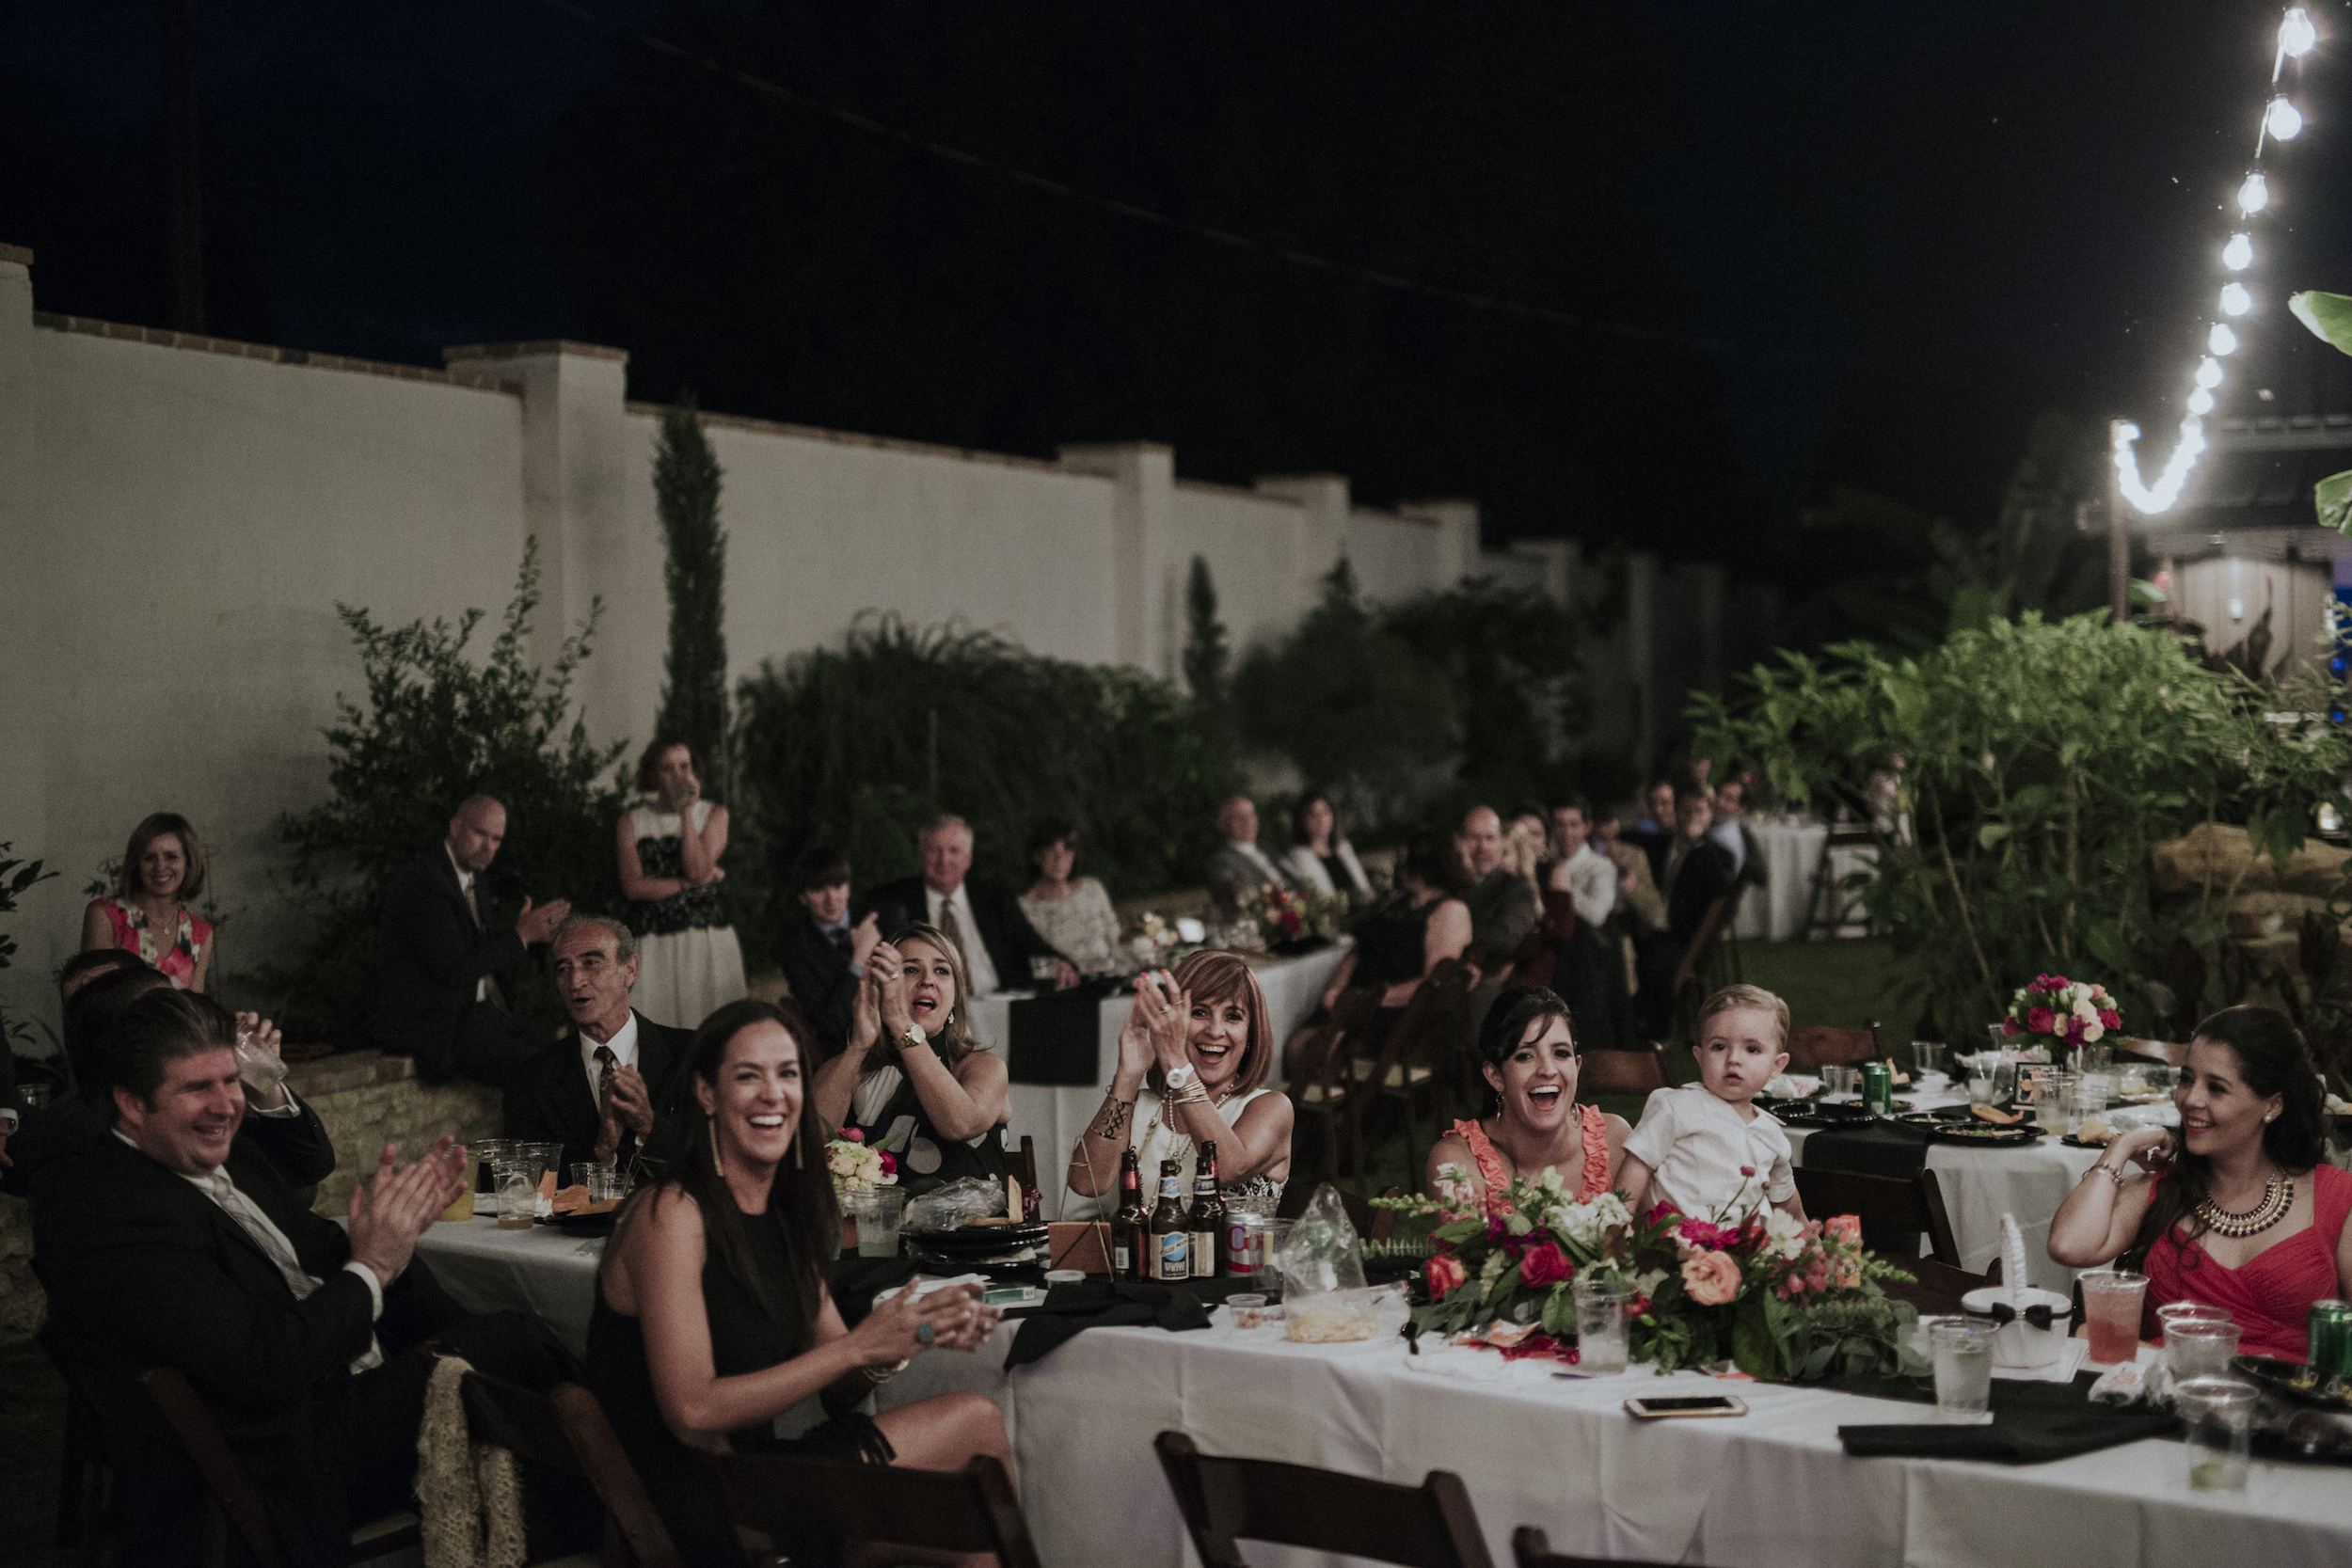 Garden Grove Wedding & Event Center5750.JPG